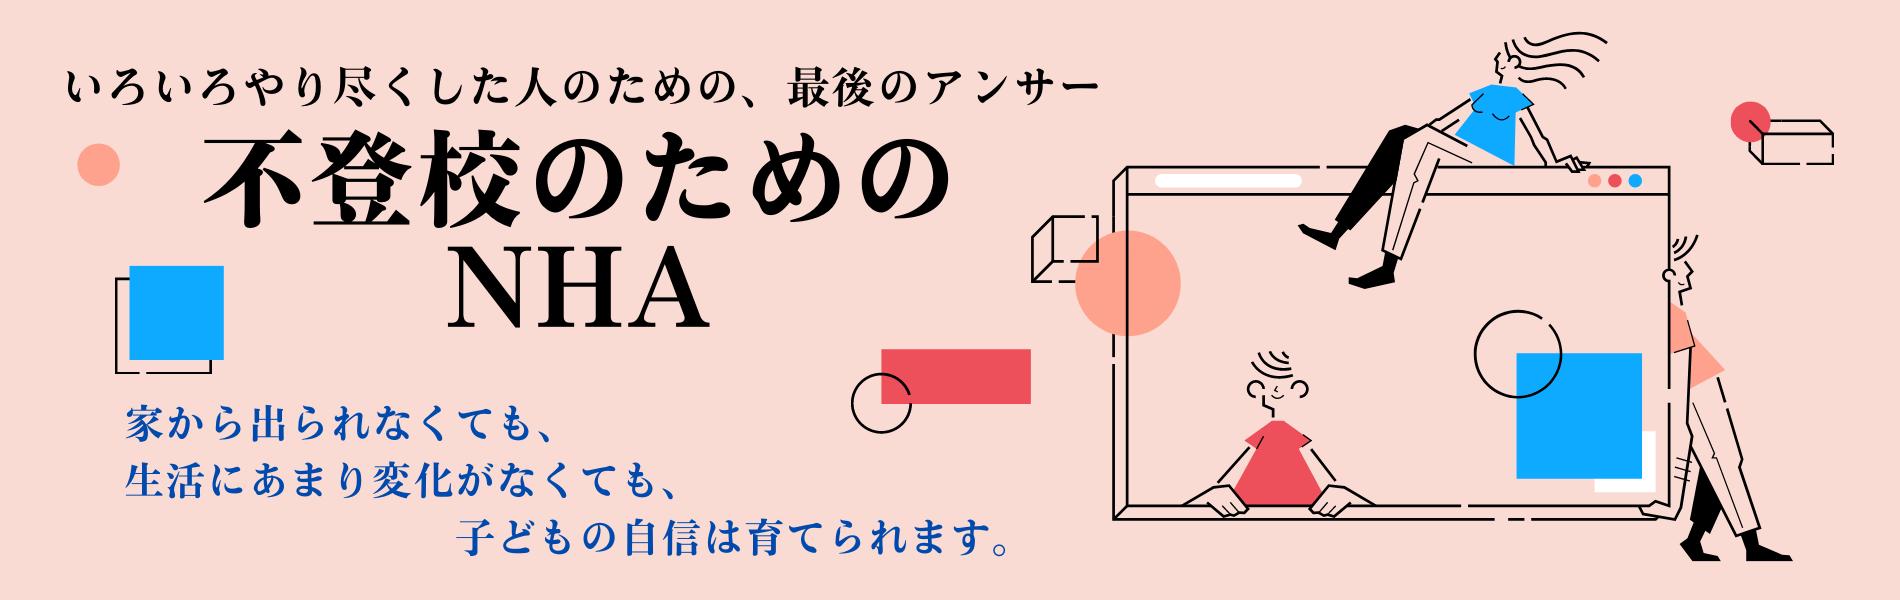 NHA 自分編オンラインコース